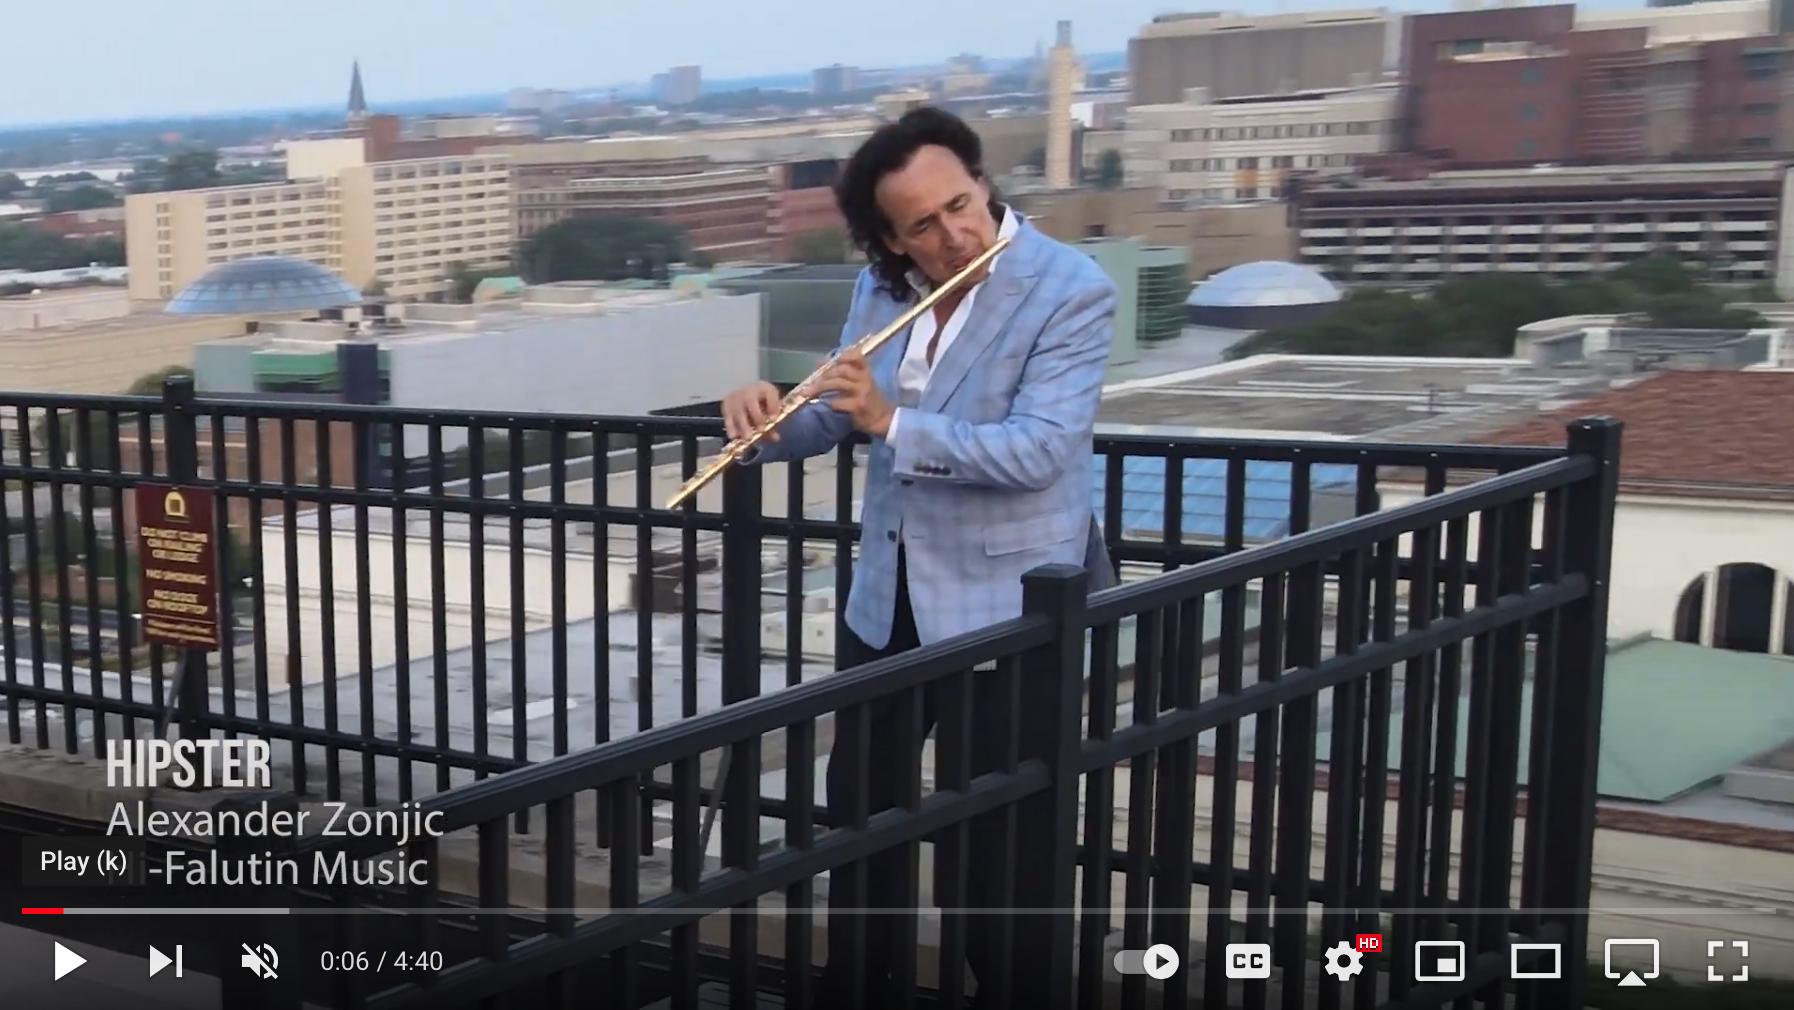 Alexander Zonjic's HIPSTER Video Debut